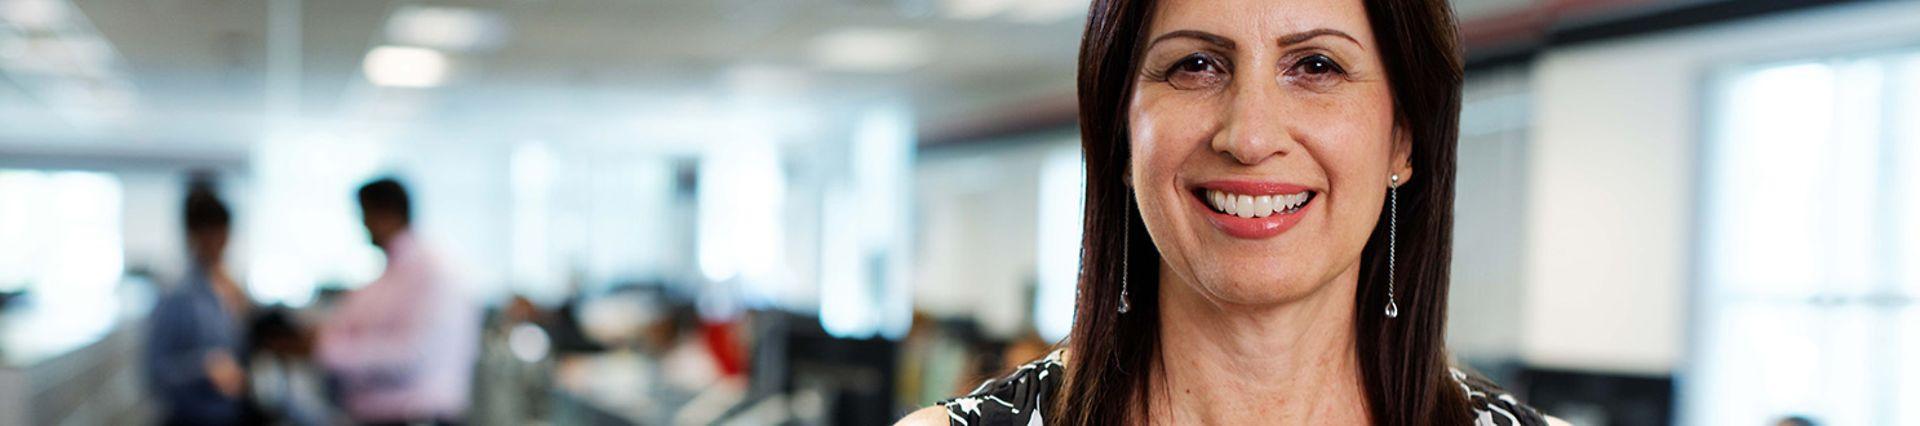 DB_Schenker_M12_Professional White Collar Female_Office